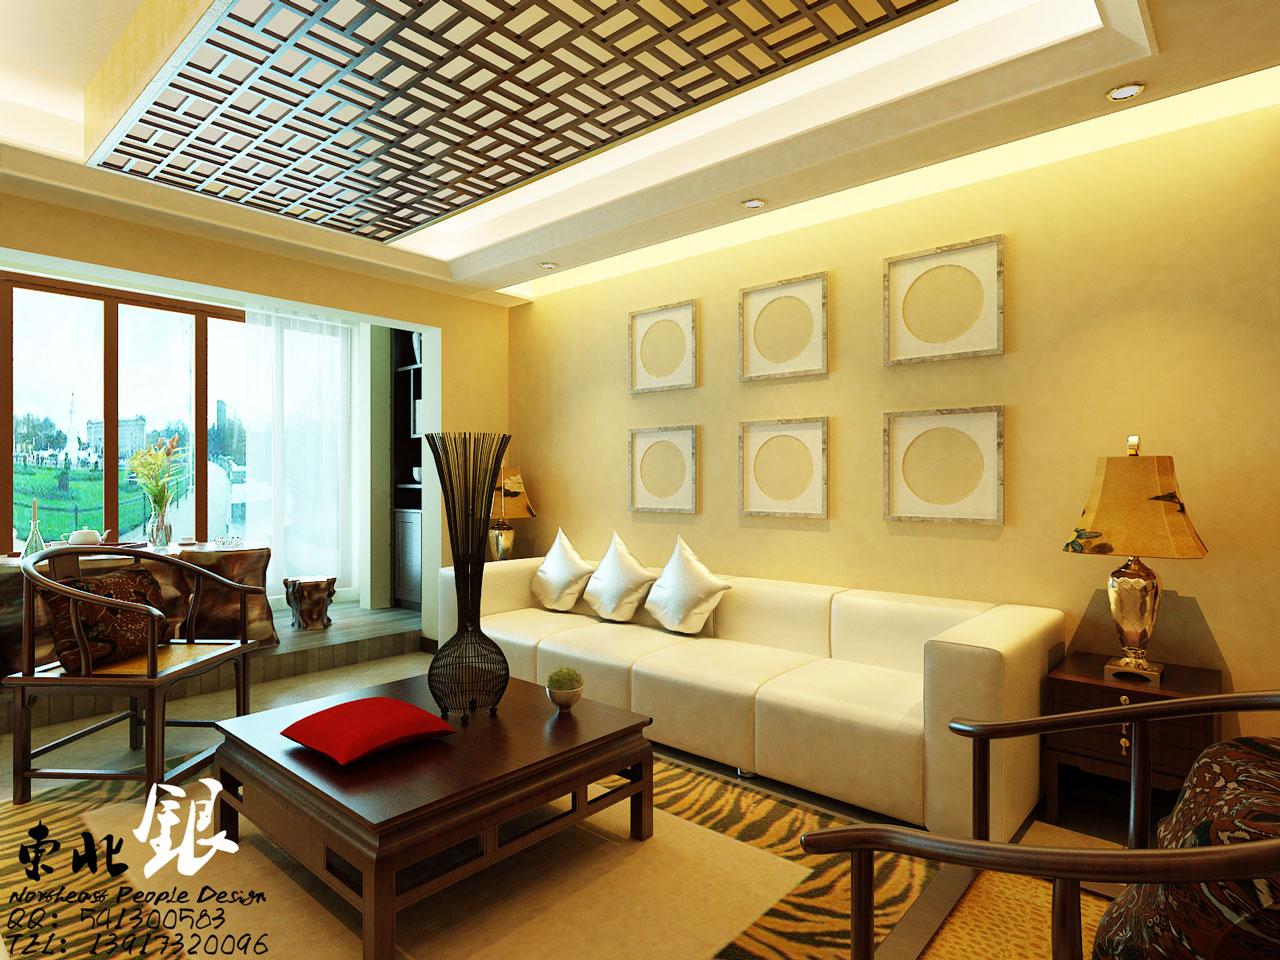 Asian Inspired Wall Art Interior Design Ideas